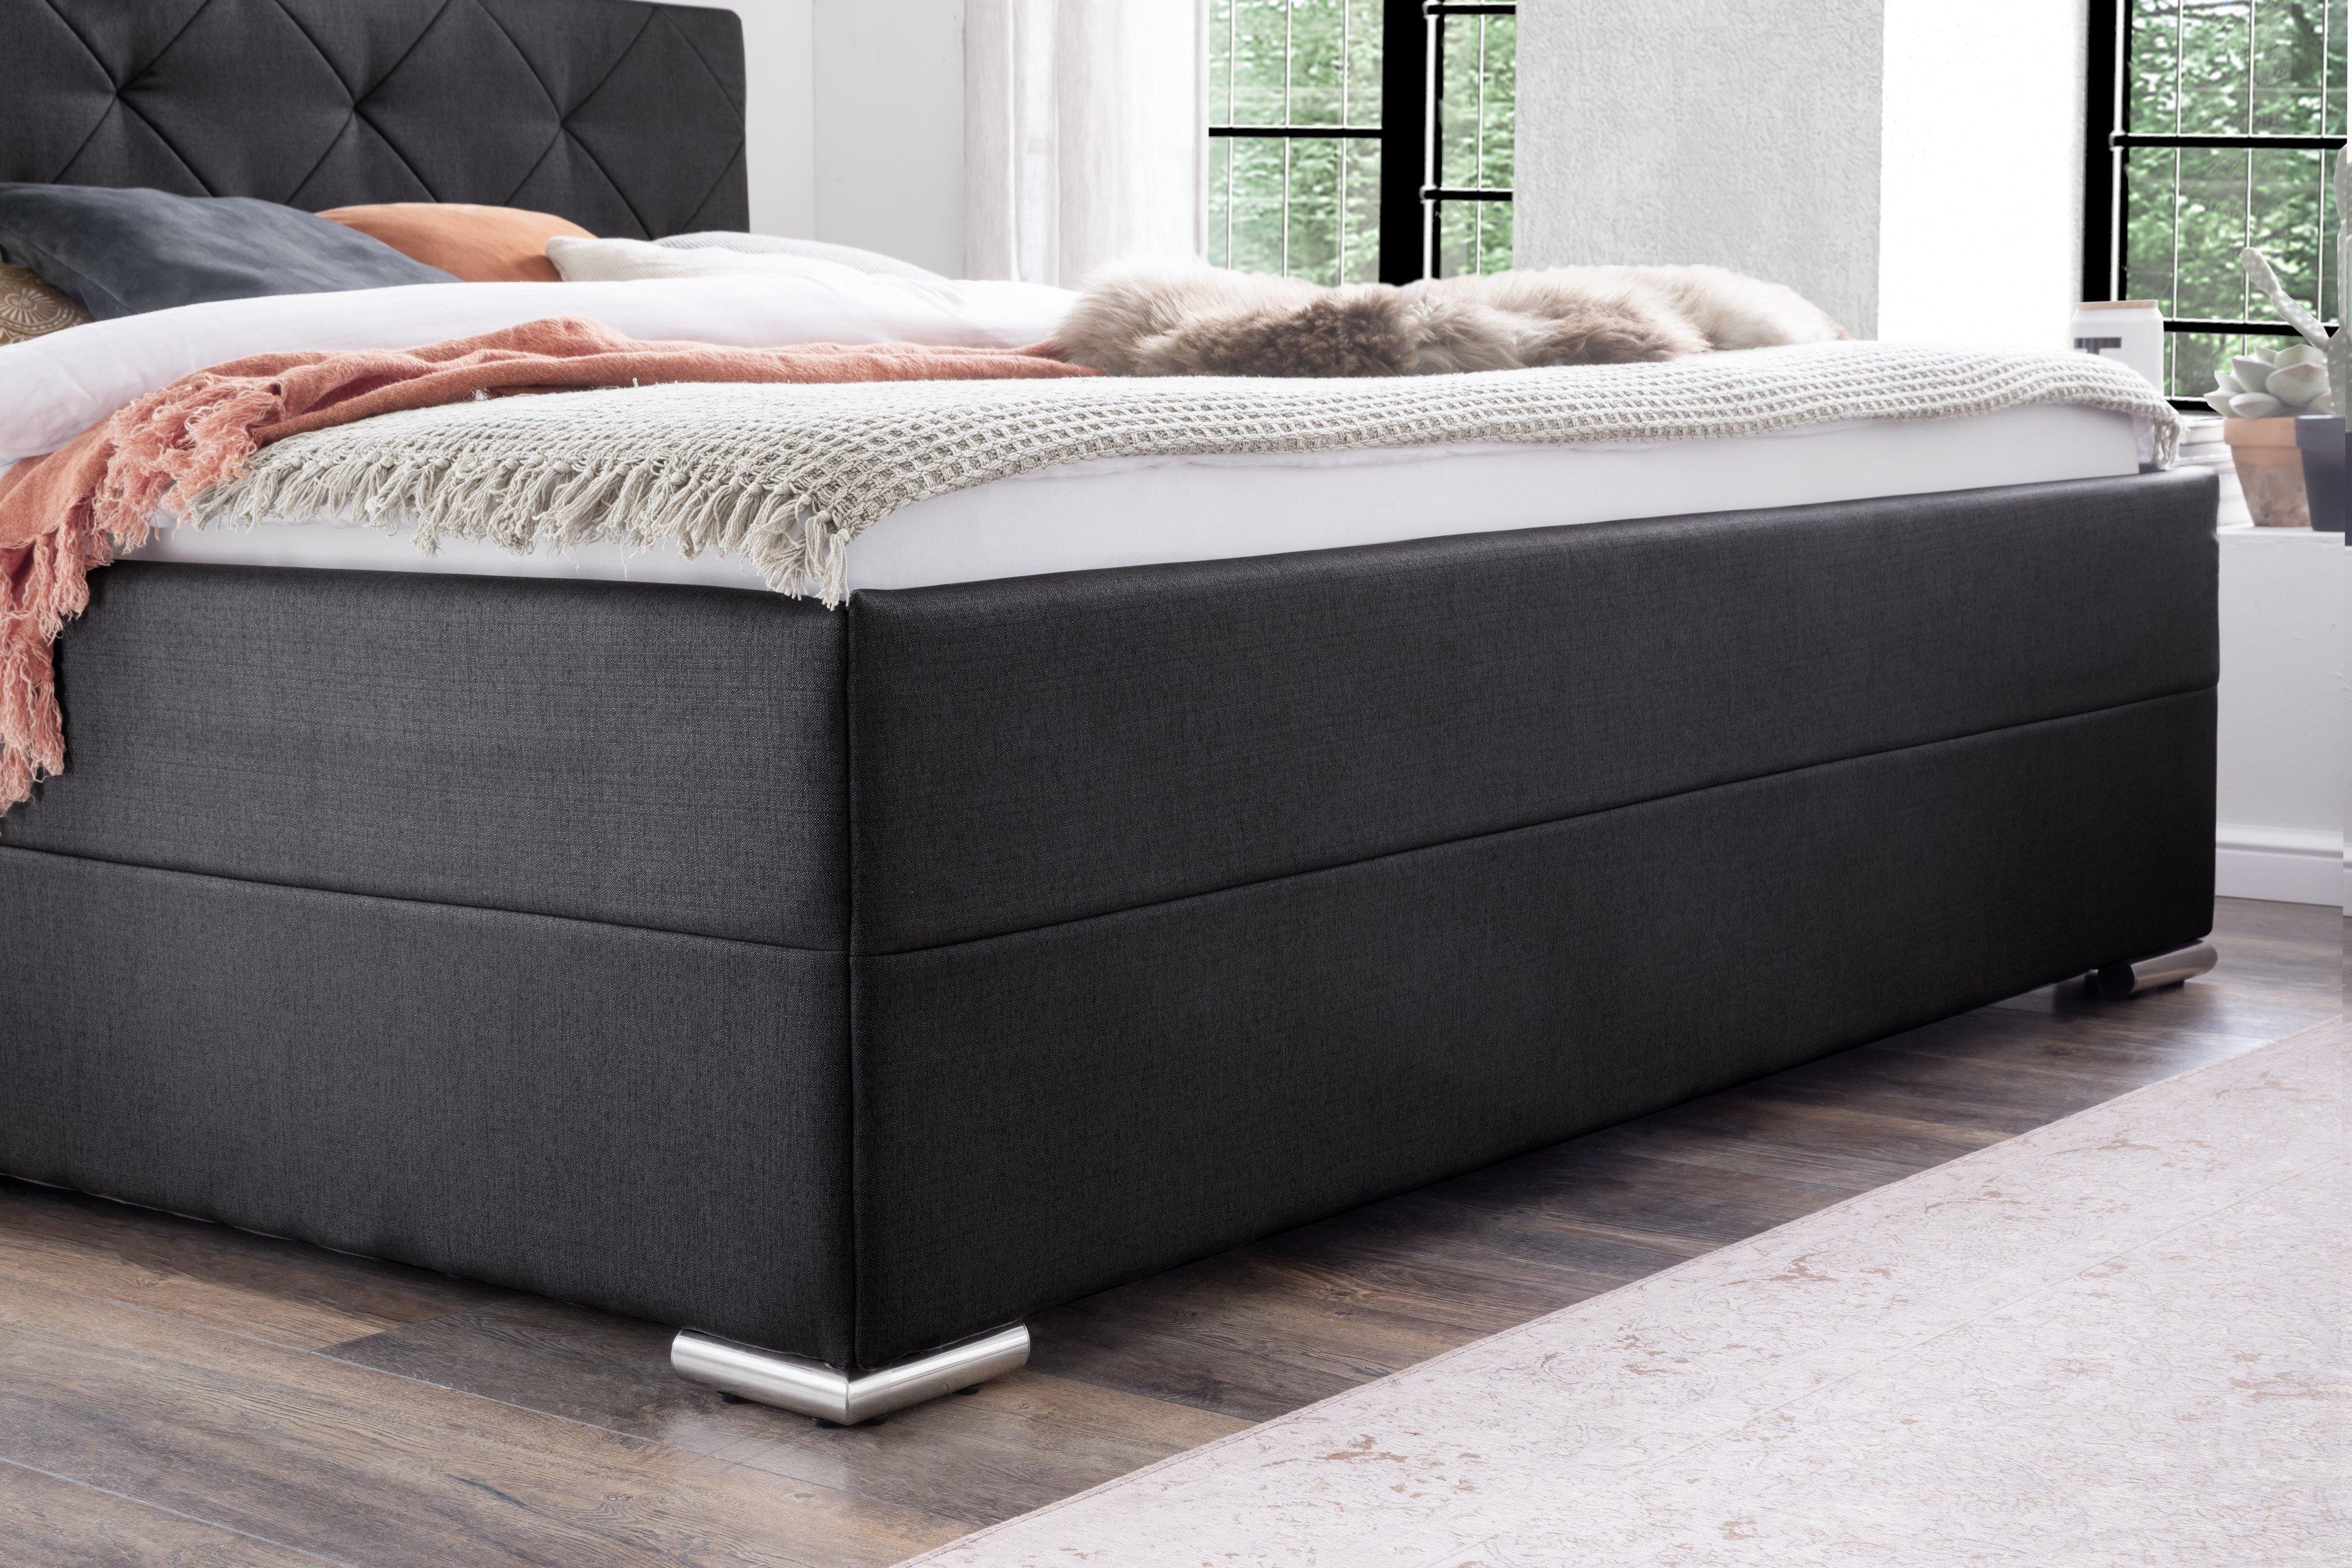 meise polsterbett chicago in anthrazit mit gepolstertem. Black Bedroom Furniture Sets. Home Design Ideas